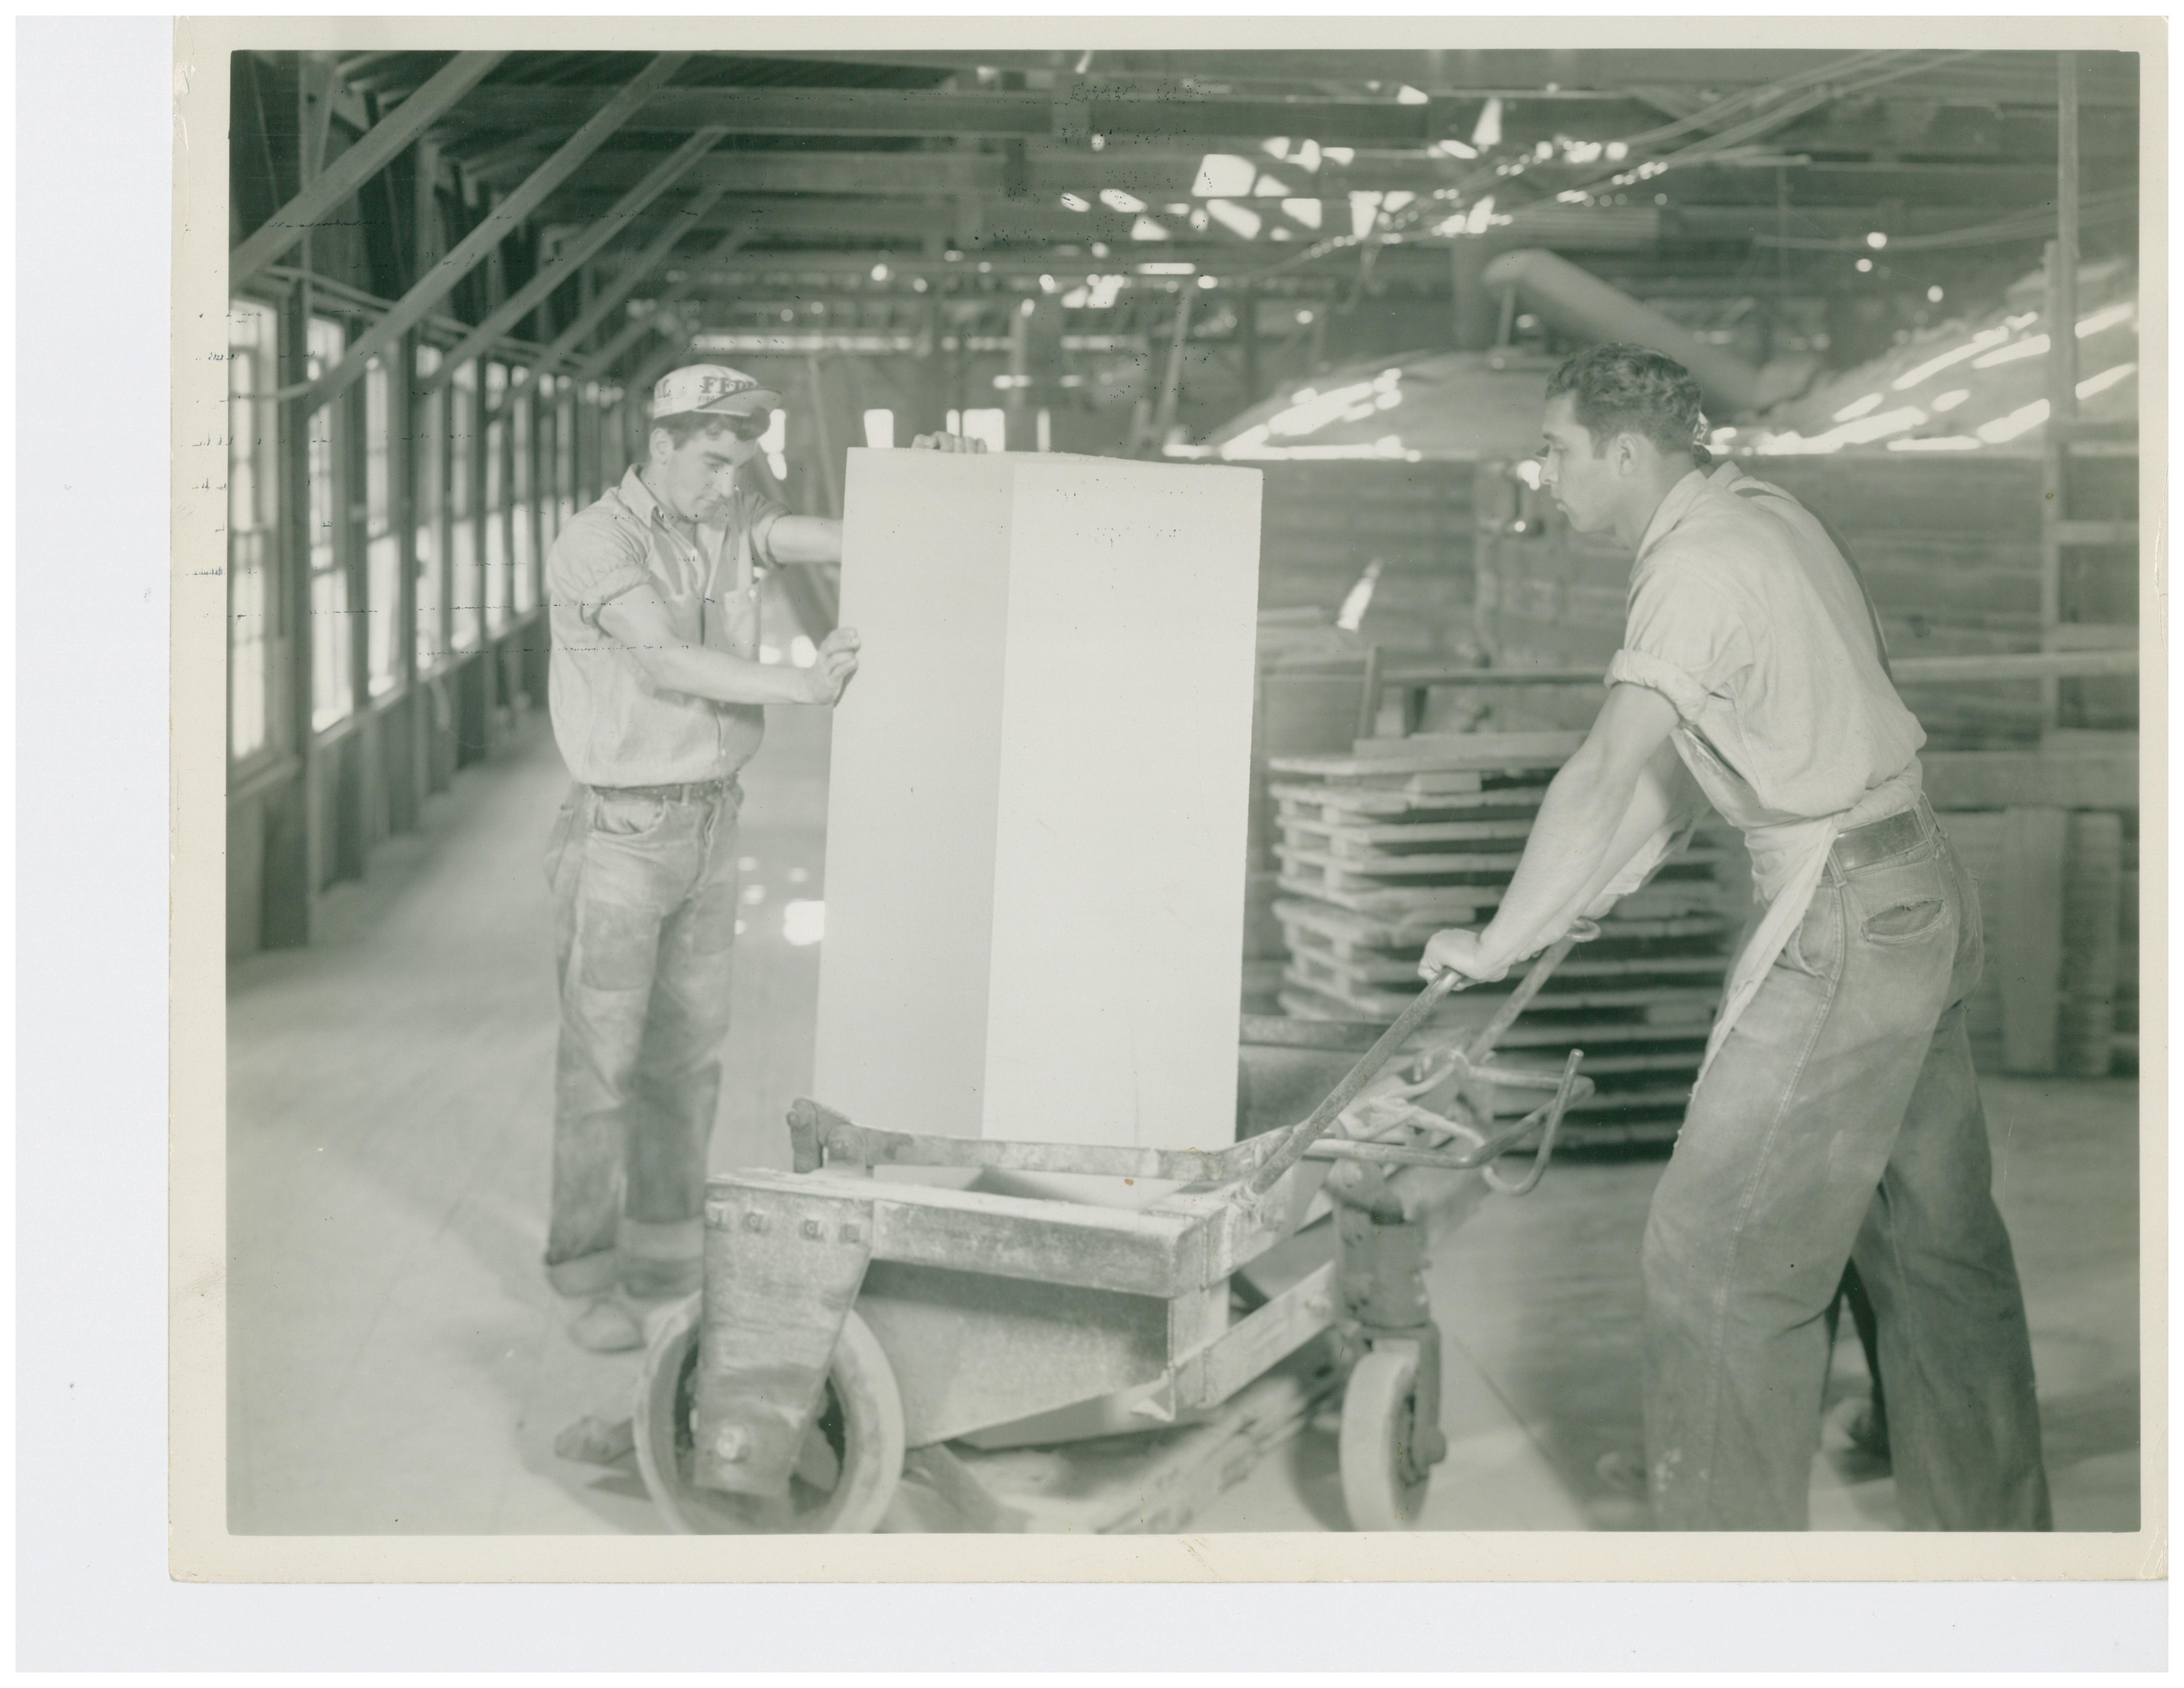 1946 Hauling Terra Cotta to be set in the Muffel Kiln